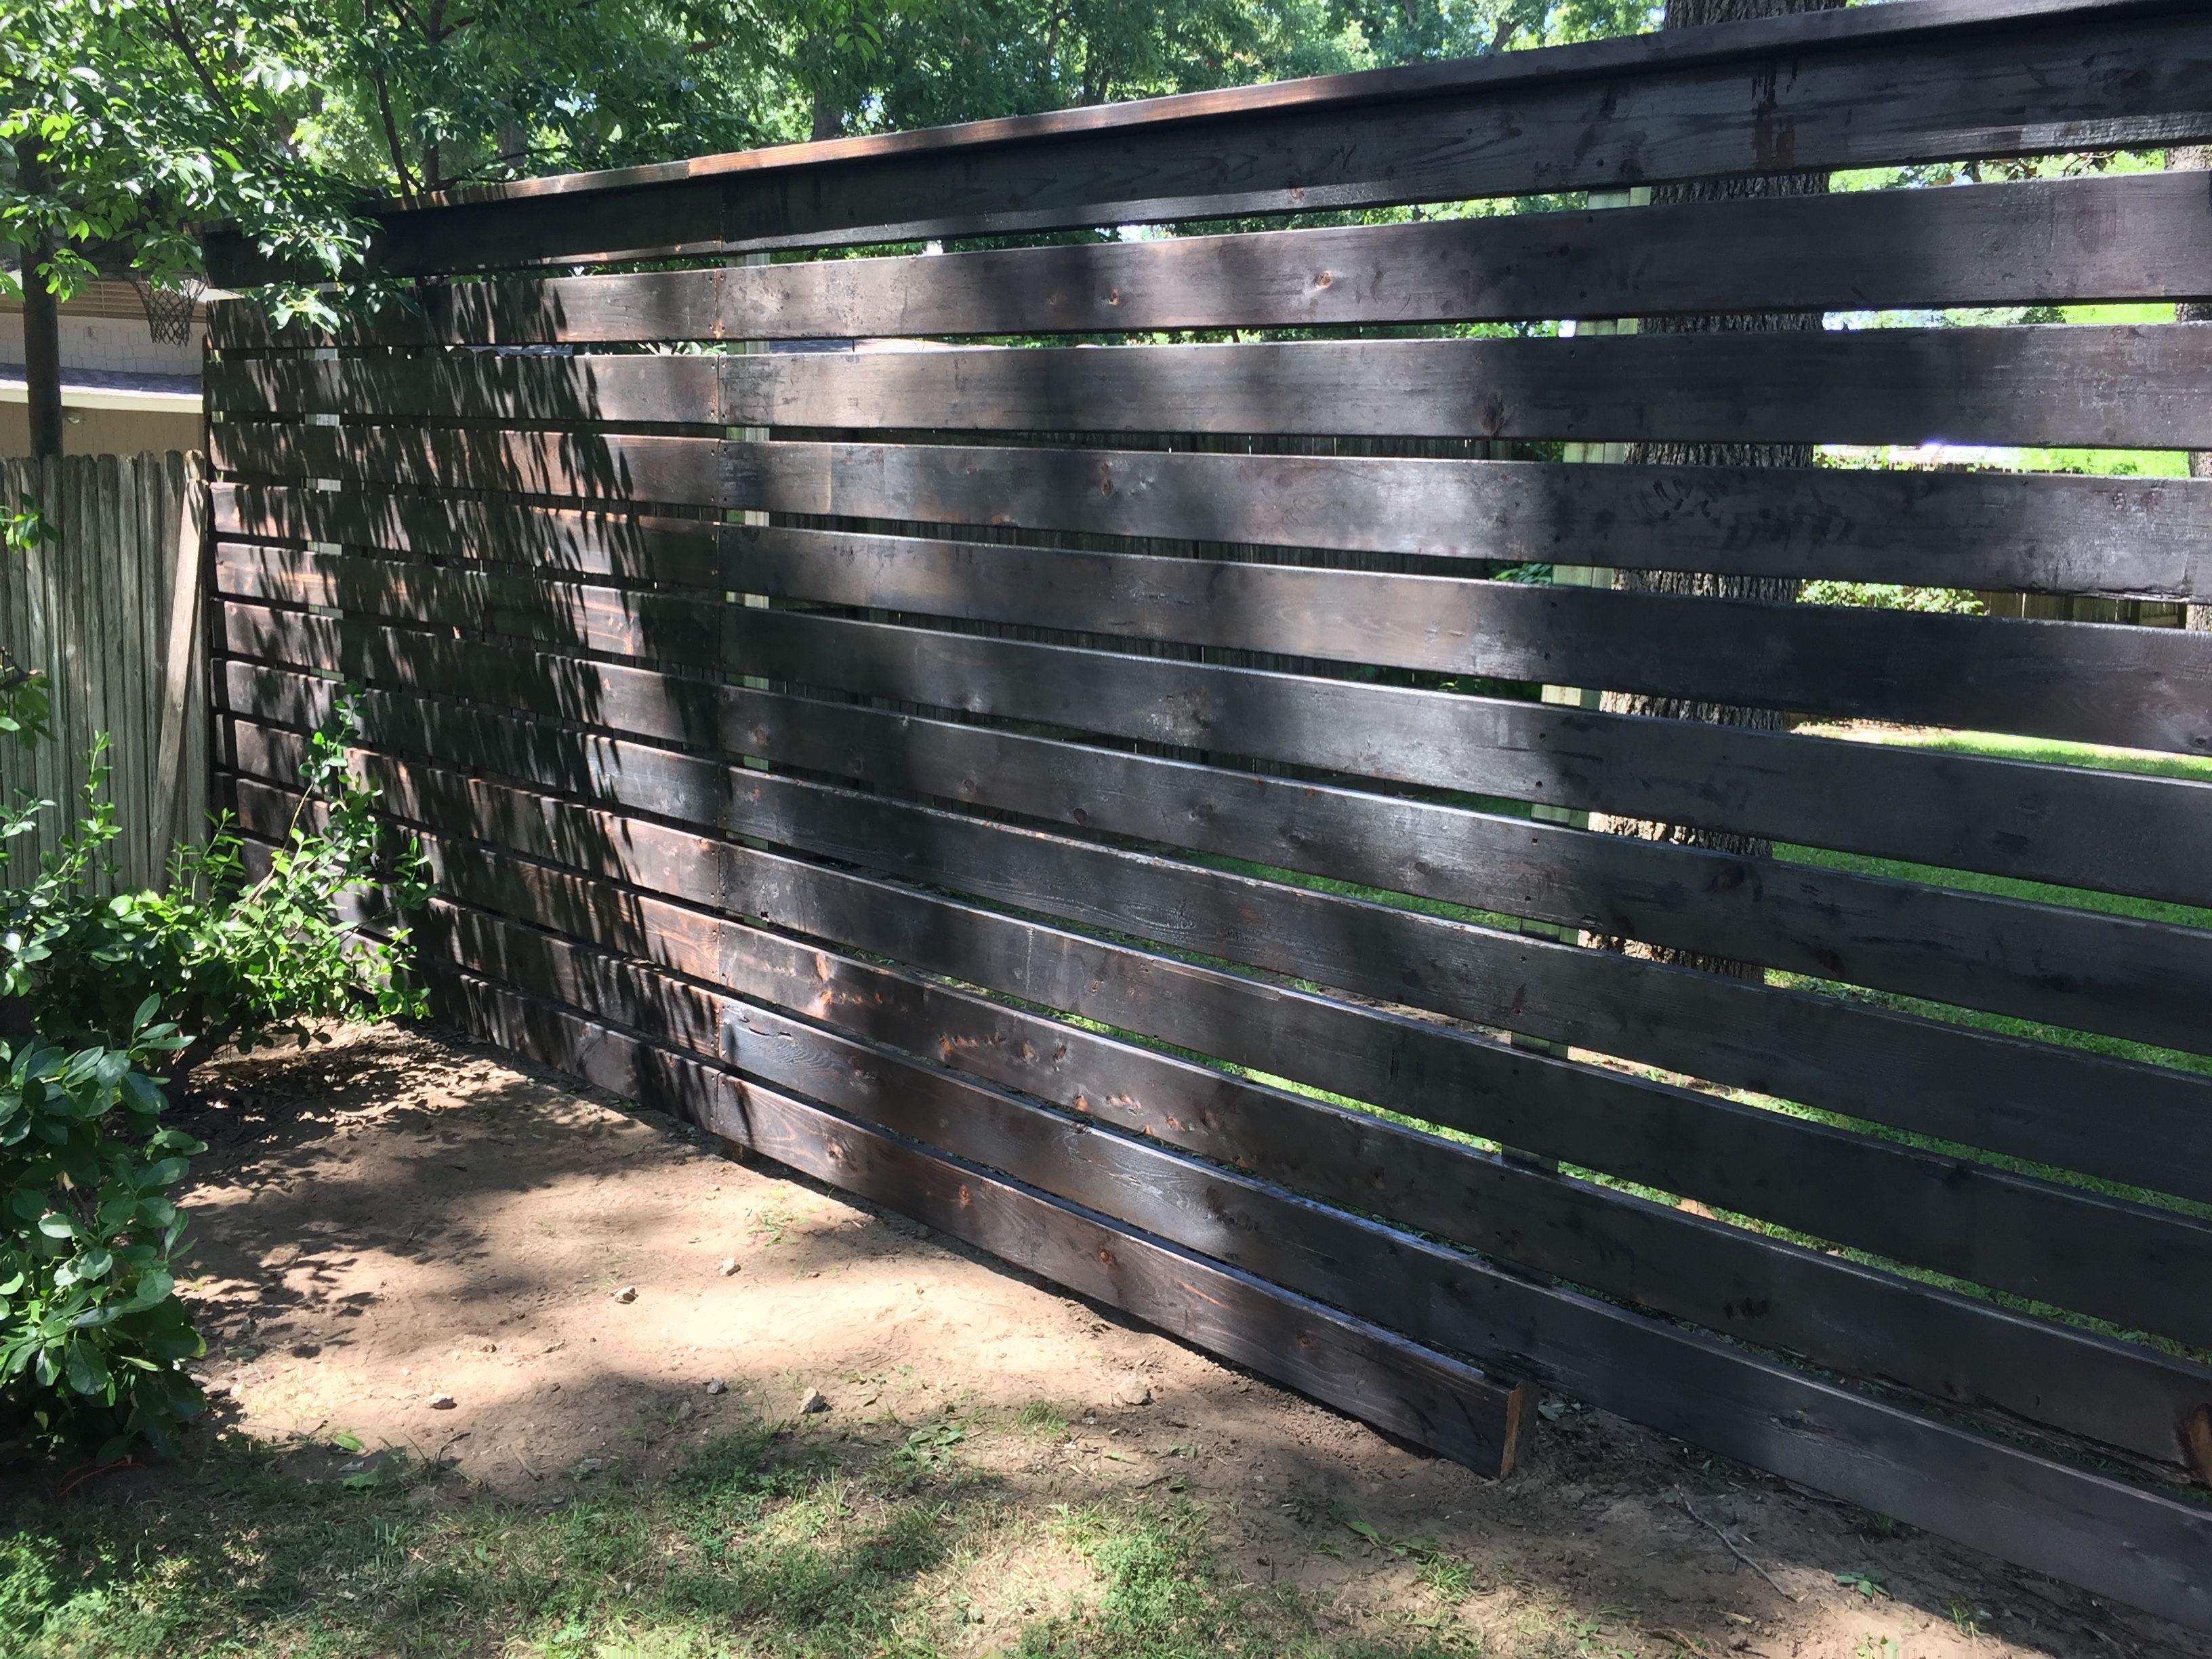 Shou Sugi Ban Horizontal Cedar Fence Used Steel Posts Pre Drilled And Screwed Each Board Into Posts One Inch Gaps B Backyard Fences Fence Design Cedar Fence